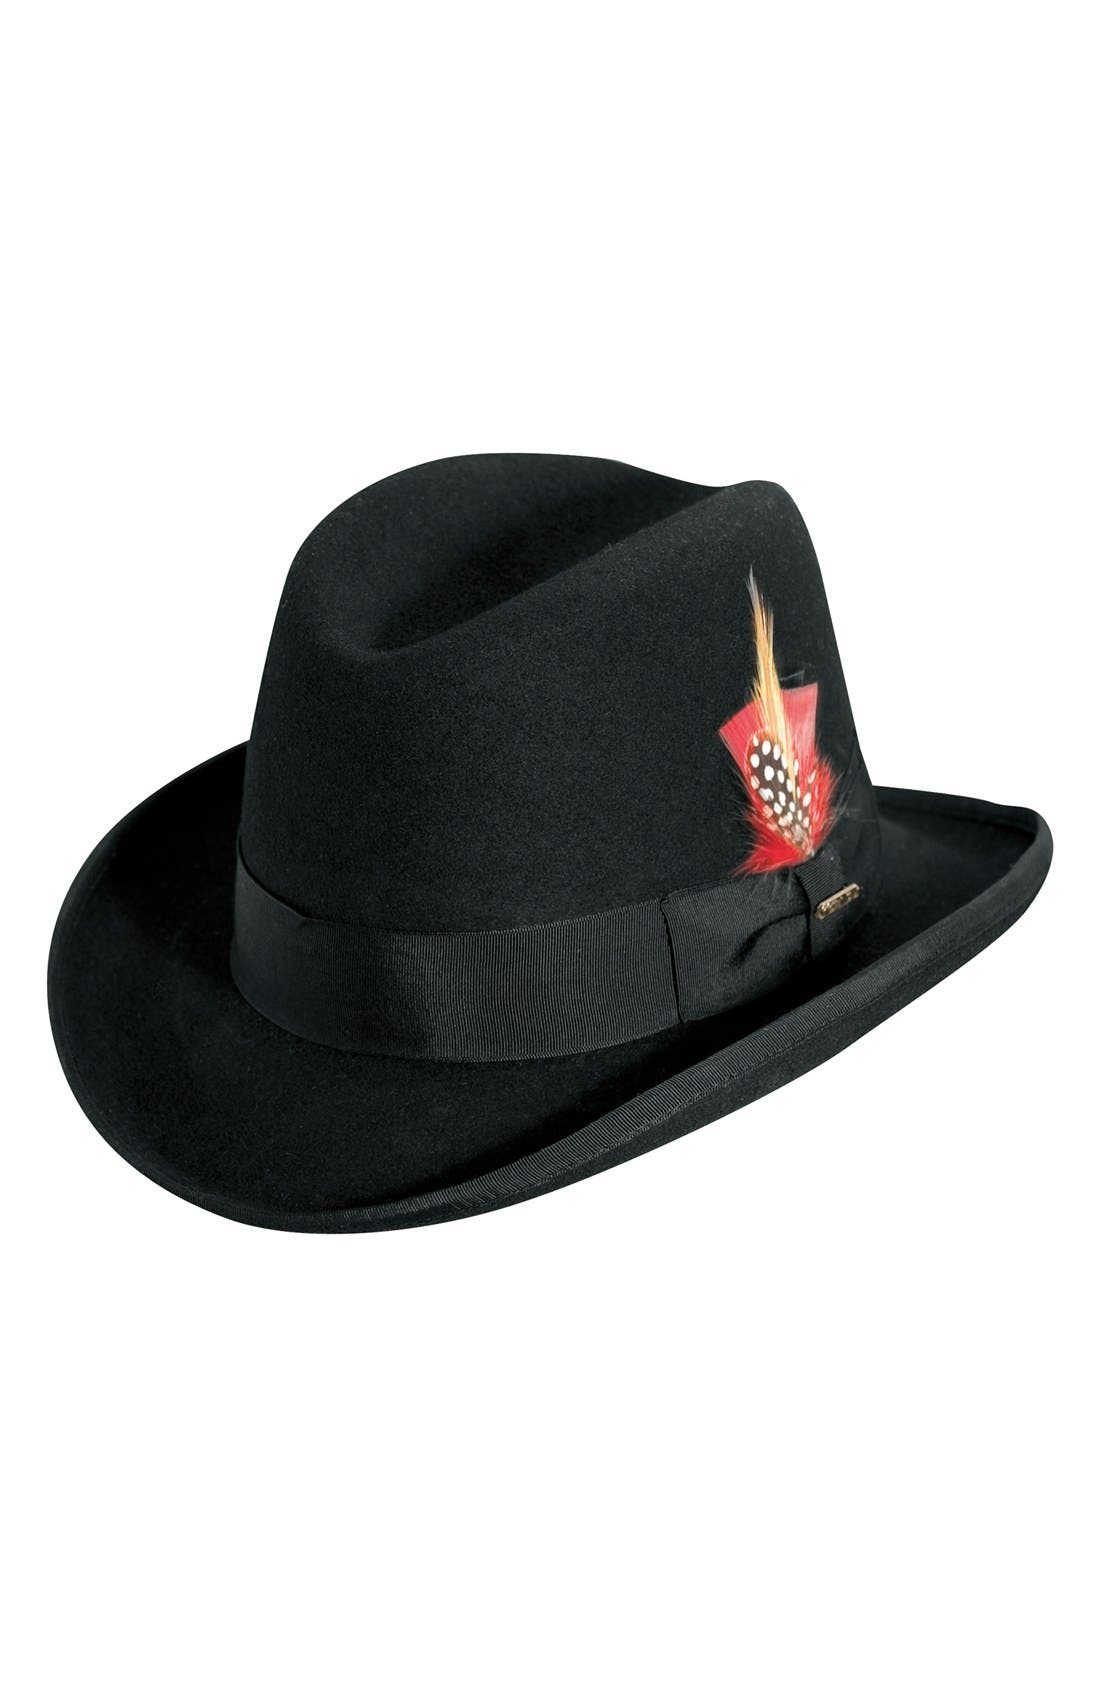 Wool Homburg Hat,                             Main thumbnail 1, color,                             Black